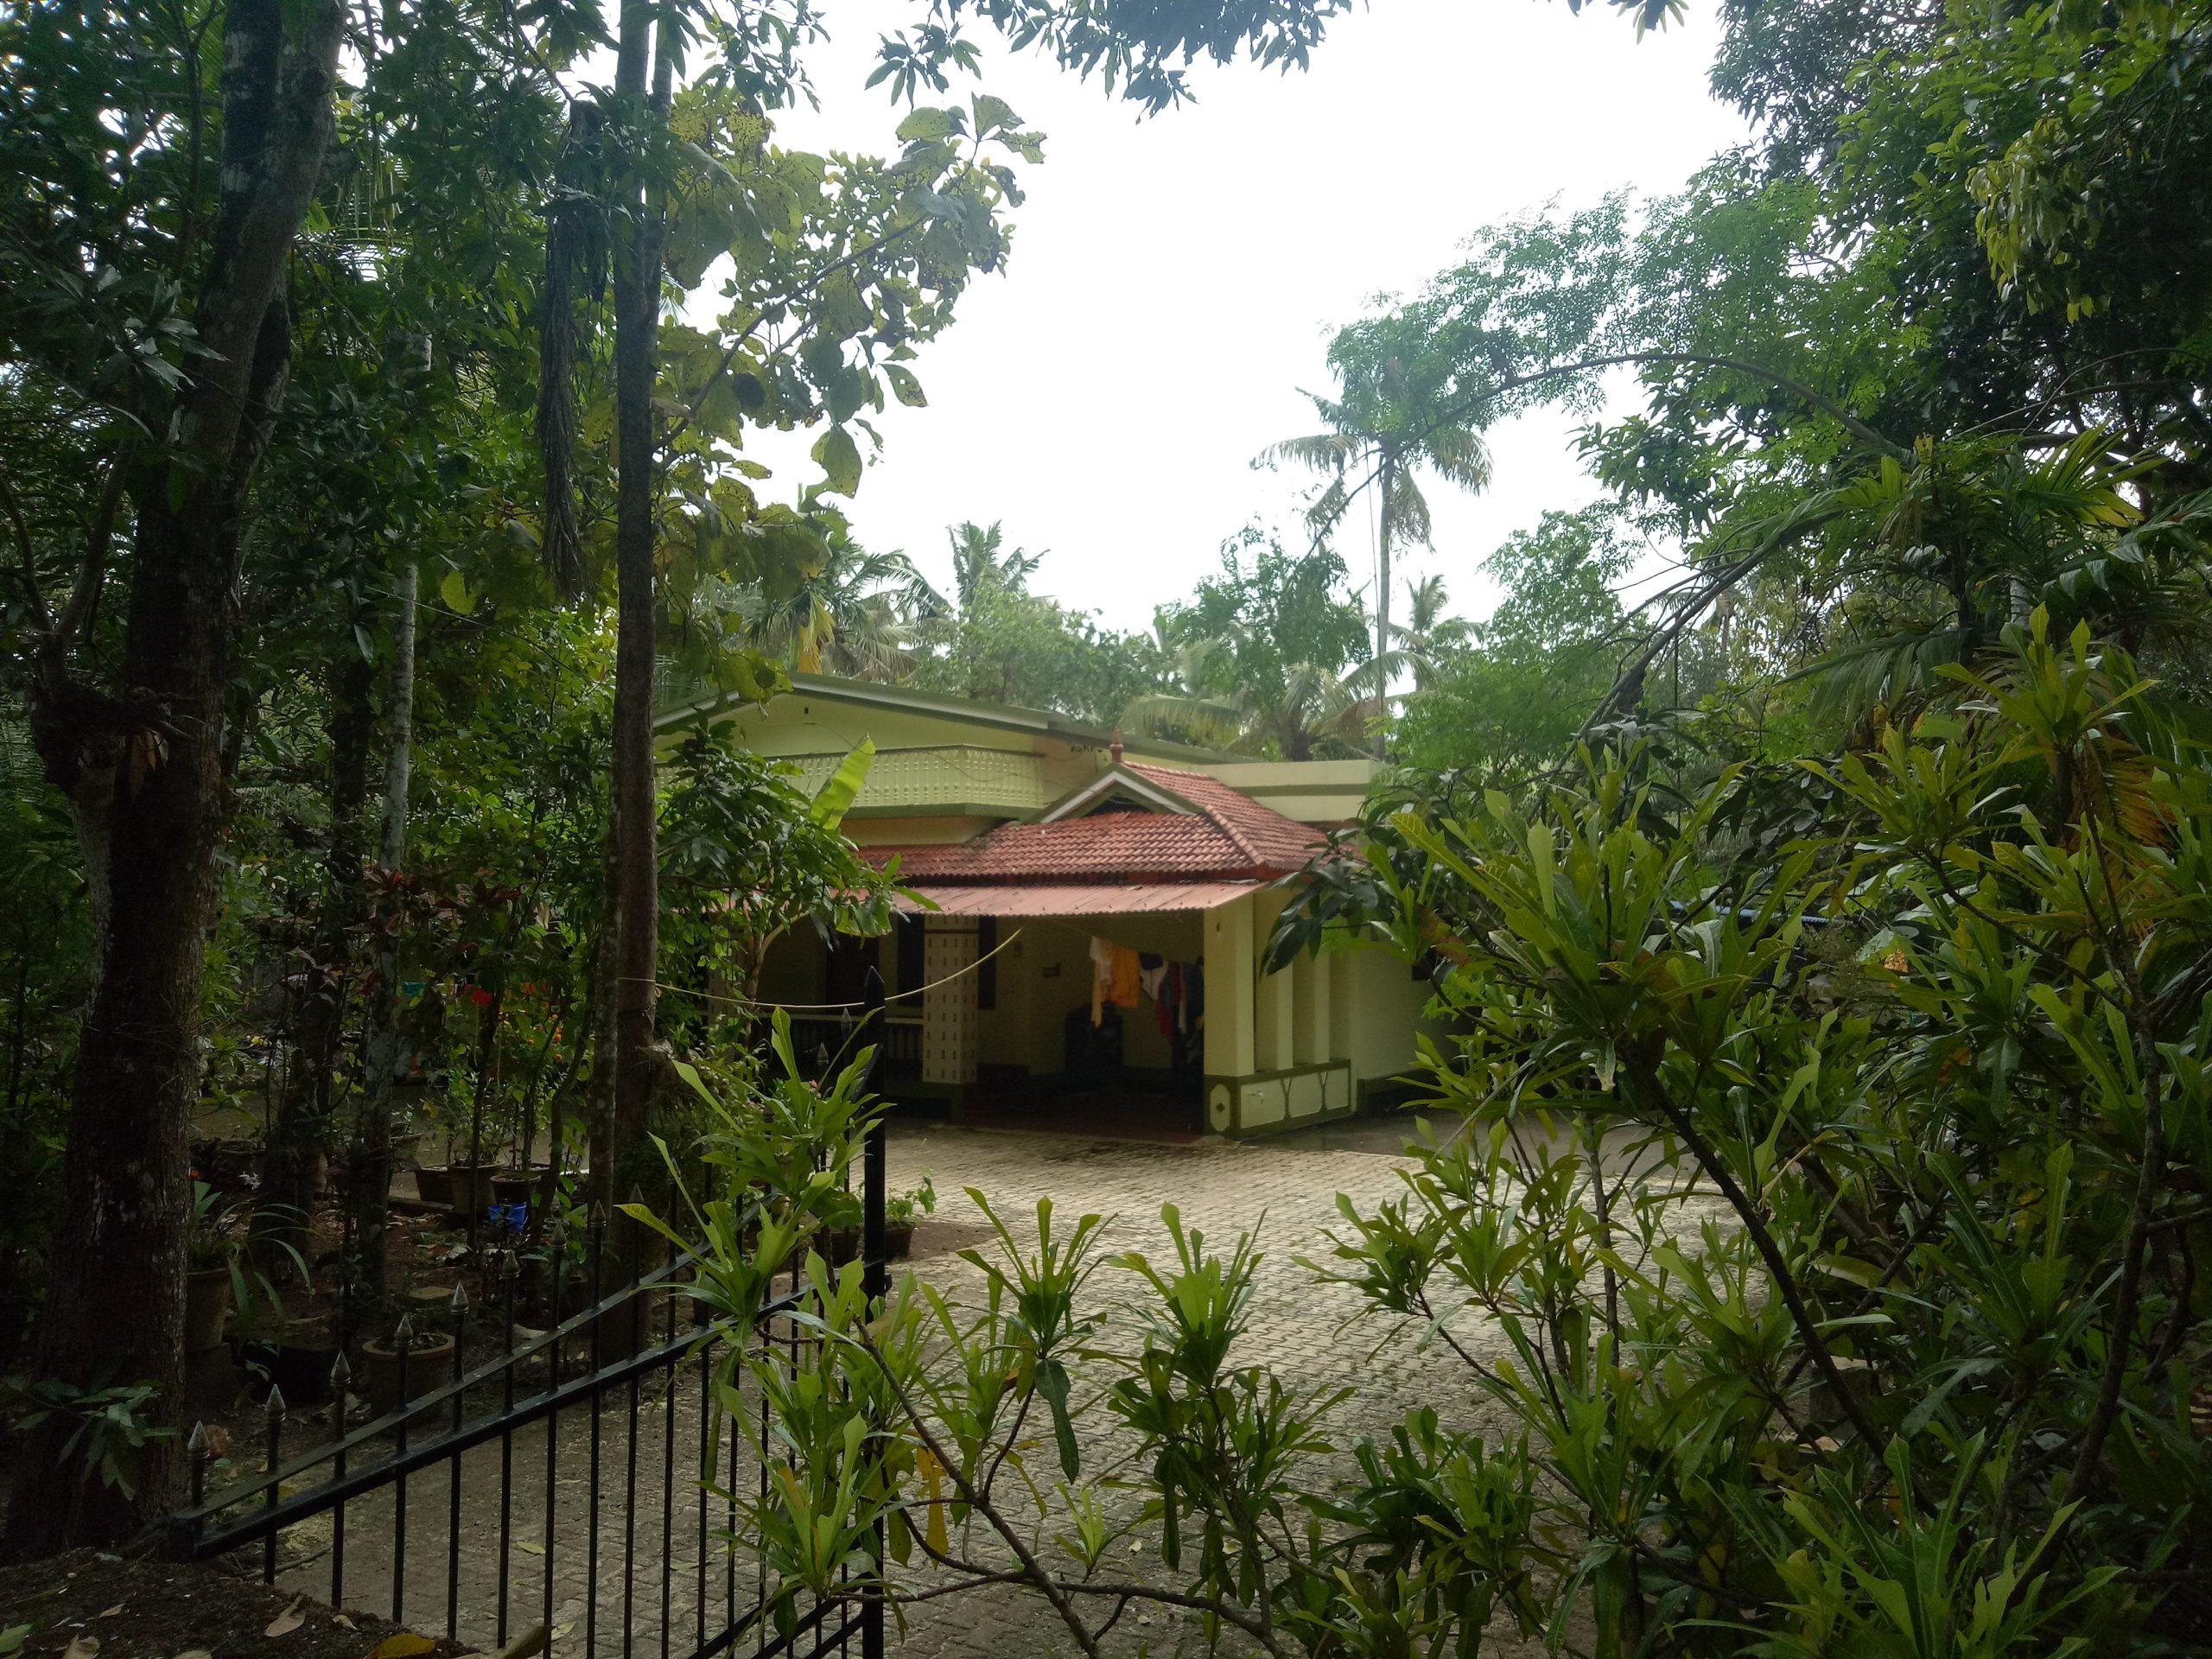 4 BHK house for Sale at Kavalloor, Padiyur, Irinjalakuda